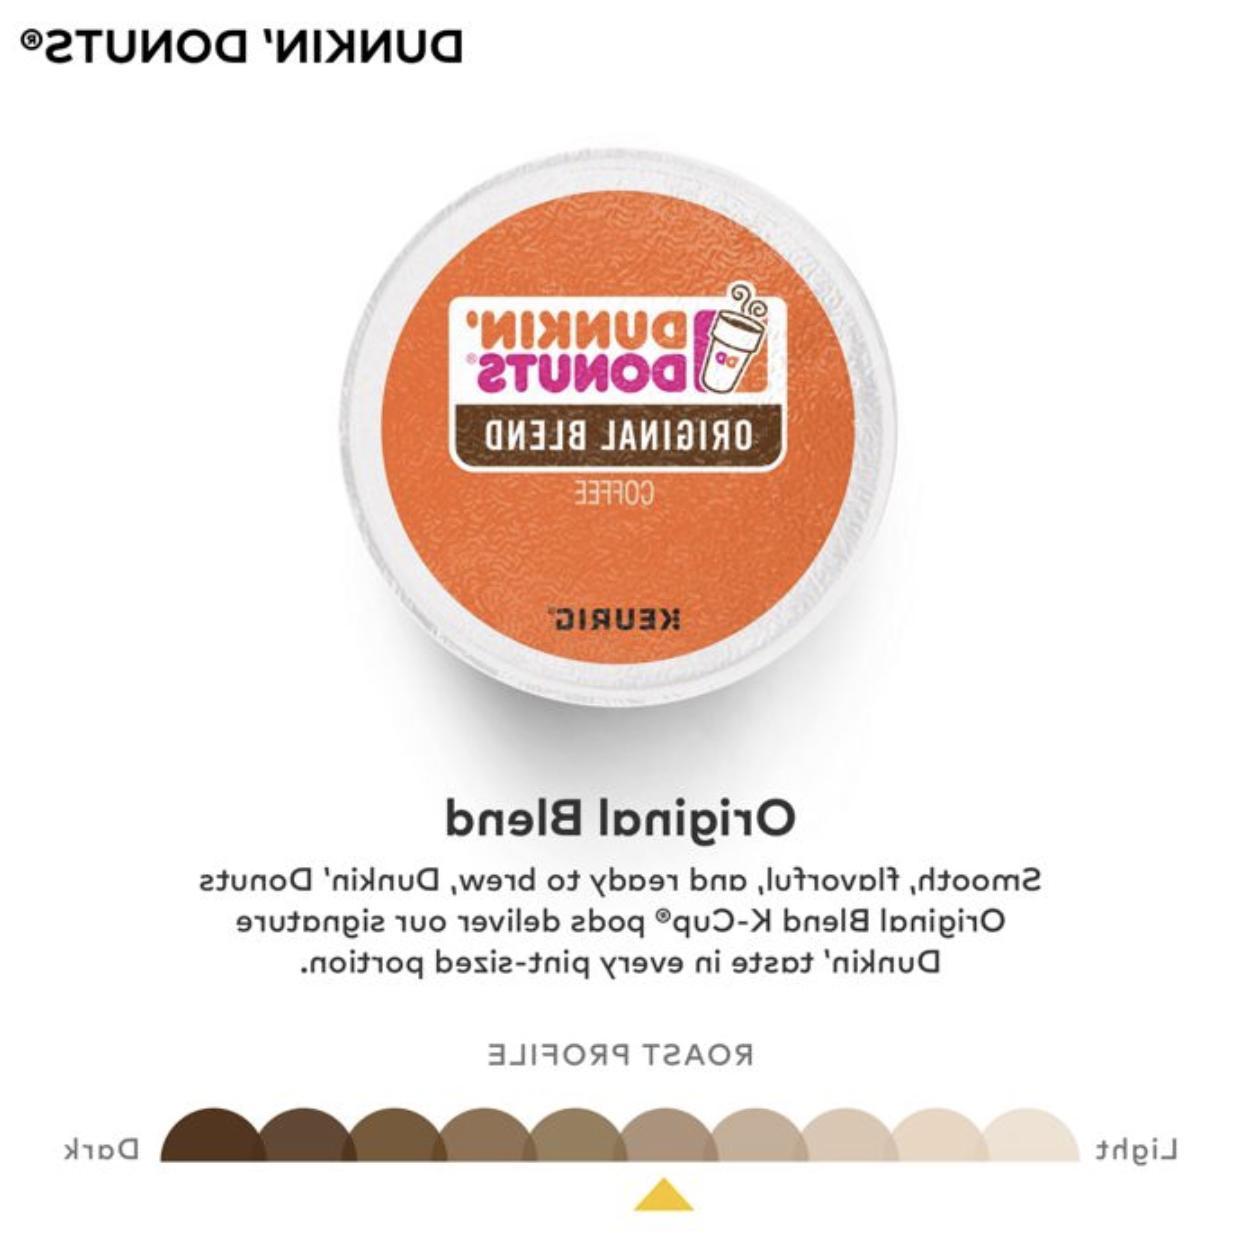 Dunkin Original Blend Keurig K-Cups Count -